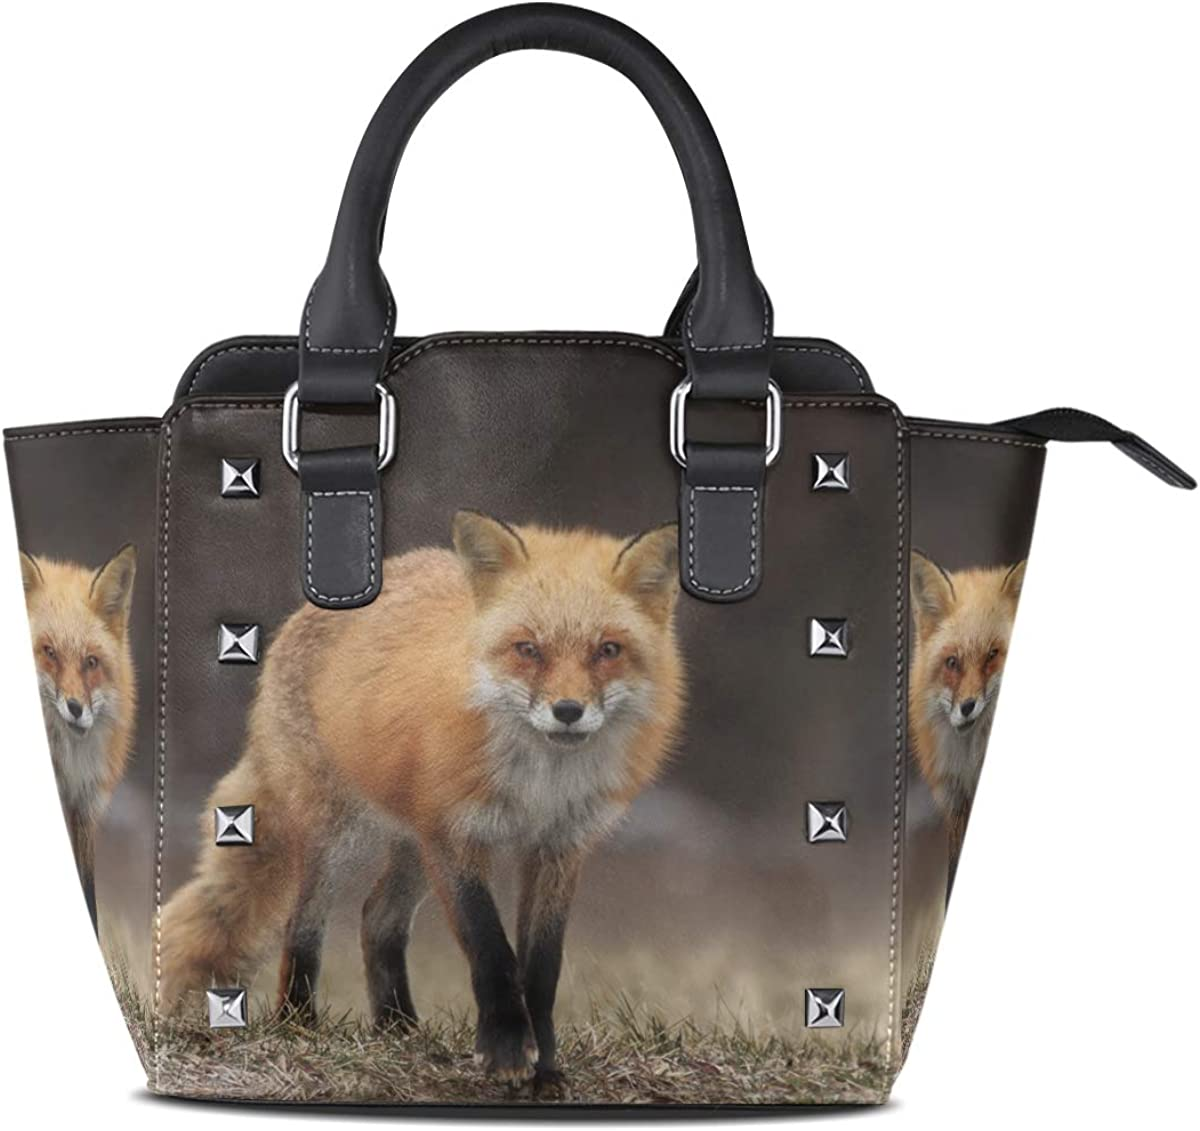 Funny Animals Paradise Men Women Fashion Satchel Messenger Bags Crossbody Sling Working Bag Travel Shoulder Bags Office//School